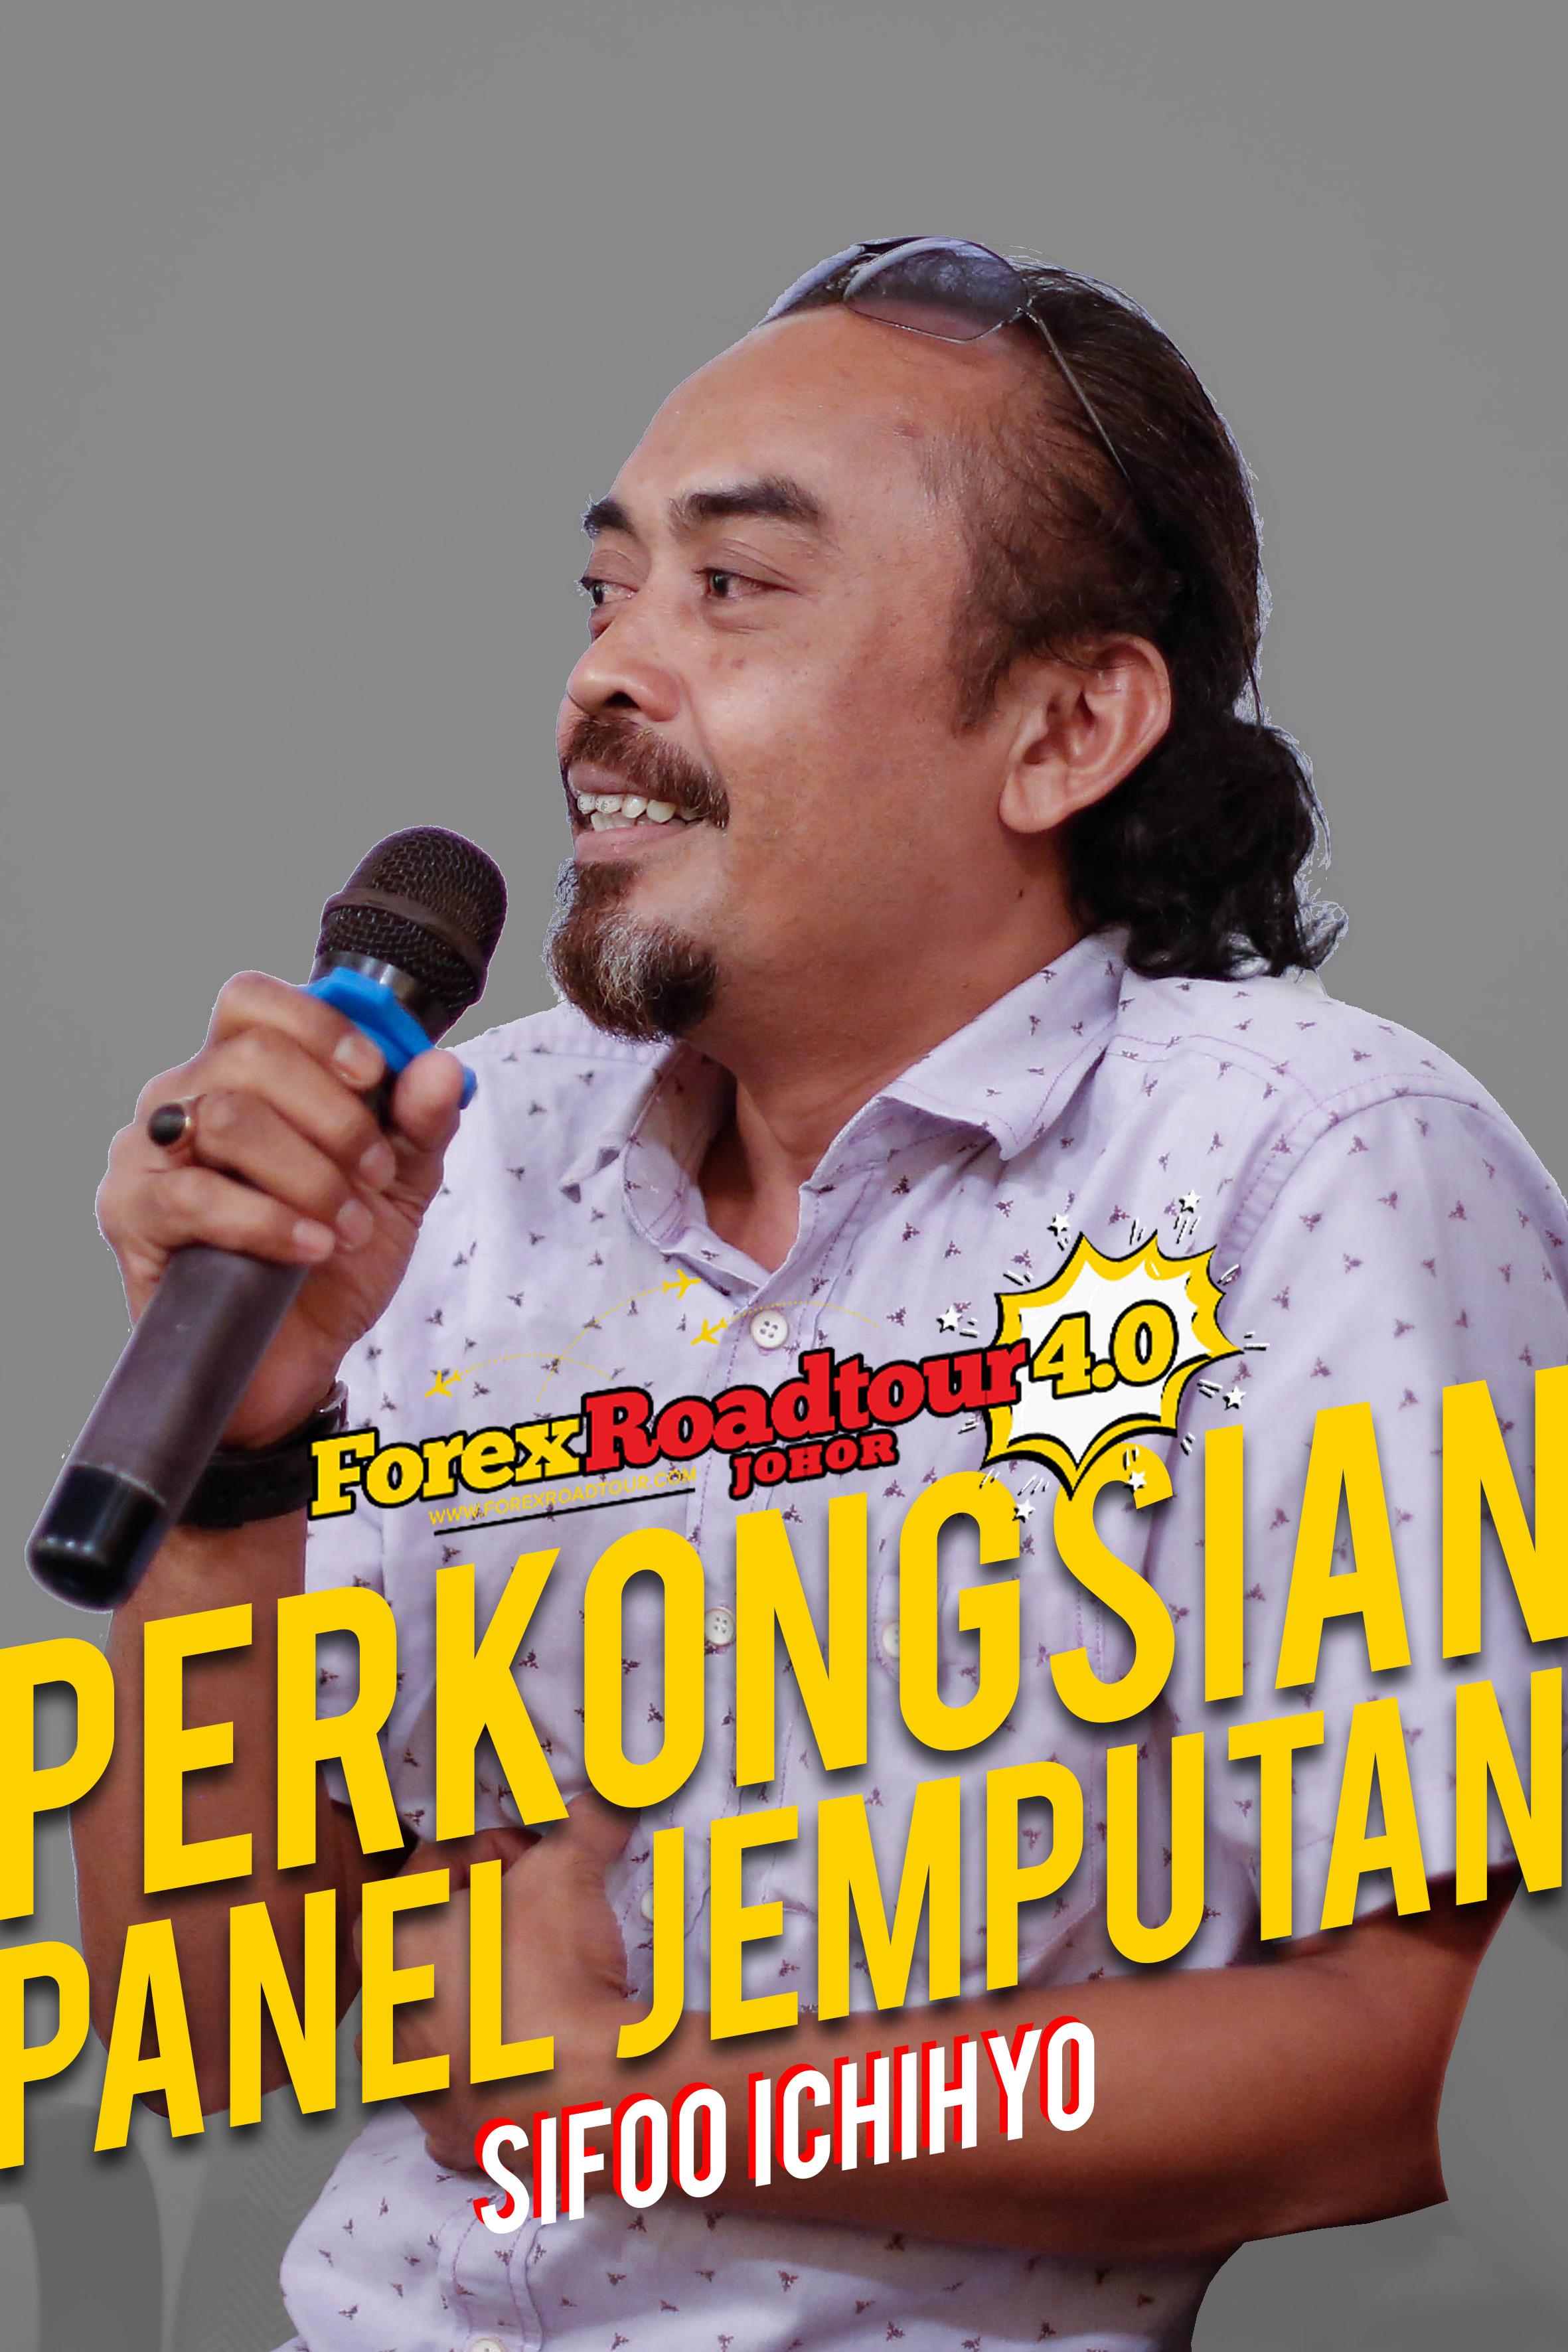 Sifoo Ichihyo [Forex Road Tour 4.0 Johor]